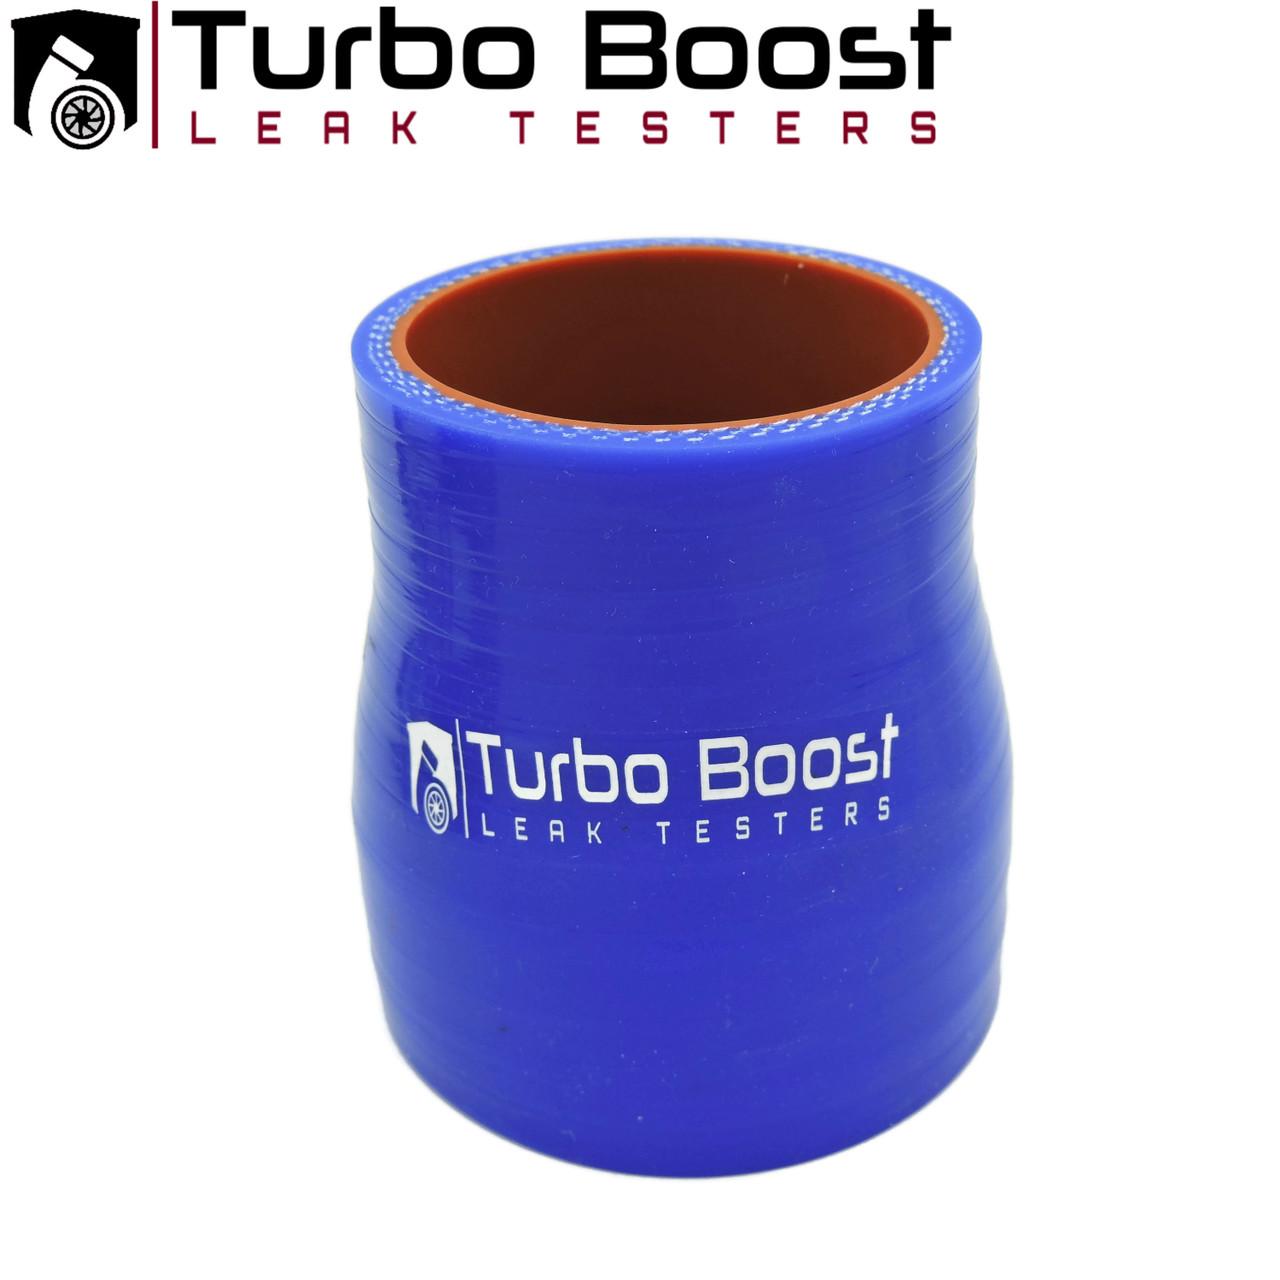 WRX FA20 (2015 +) Boost Leak Tester BILLET Aluminum- For Stock Turbo intake Pipe